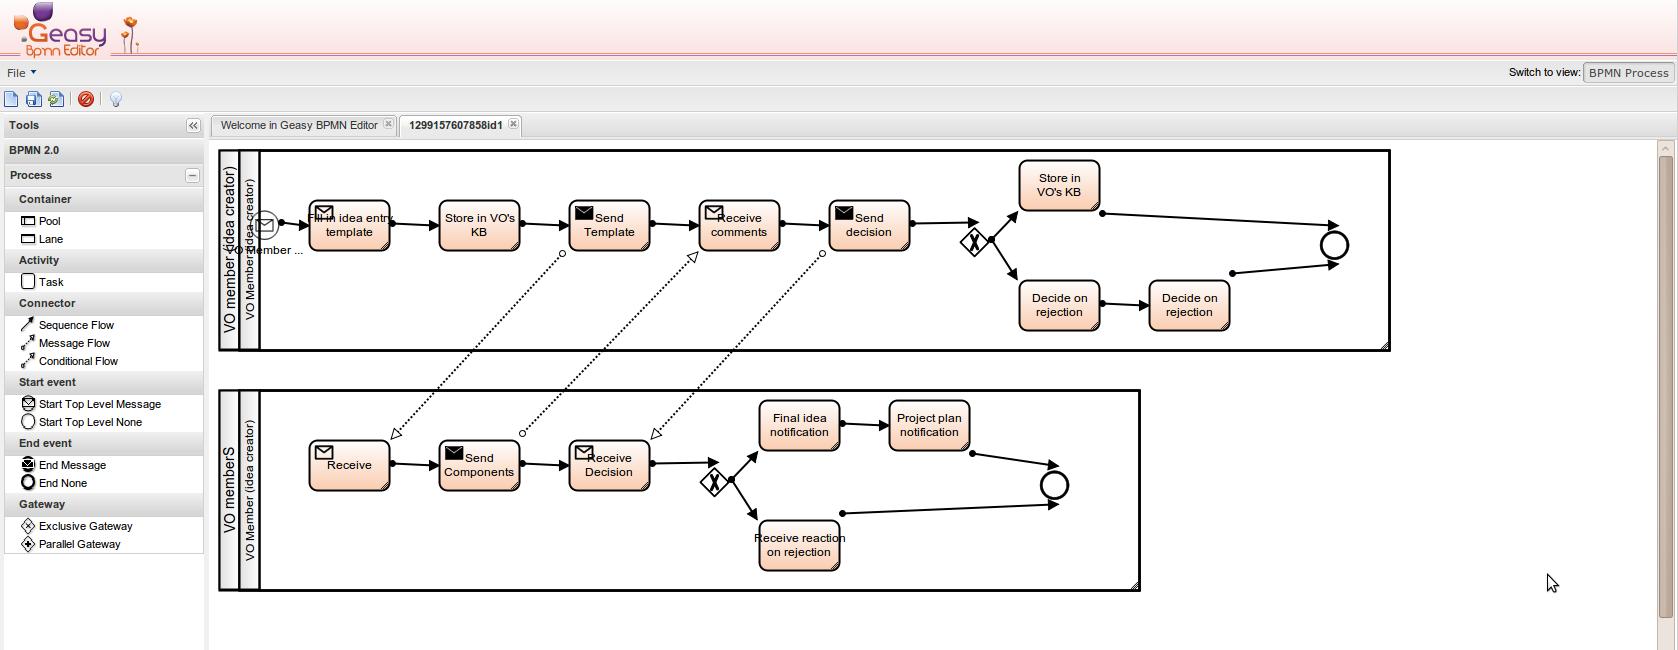 Collaboration diagram tolgjcmanagement collaboration diagram pooptronica Choice Image